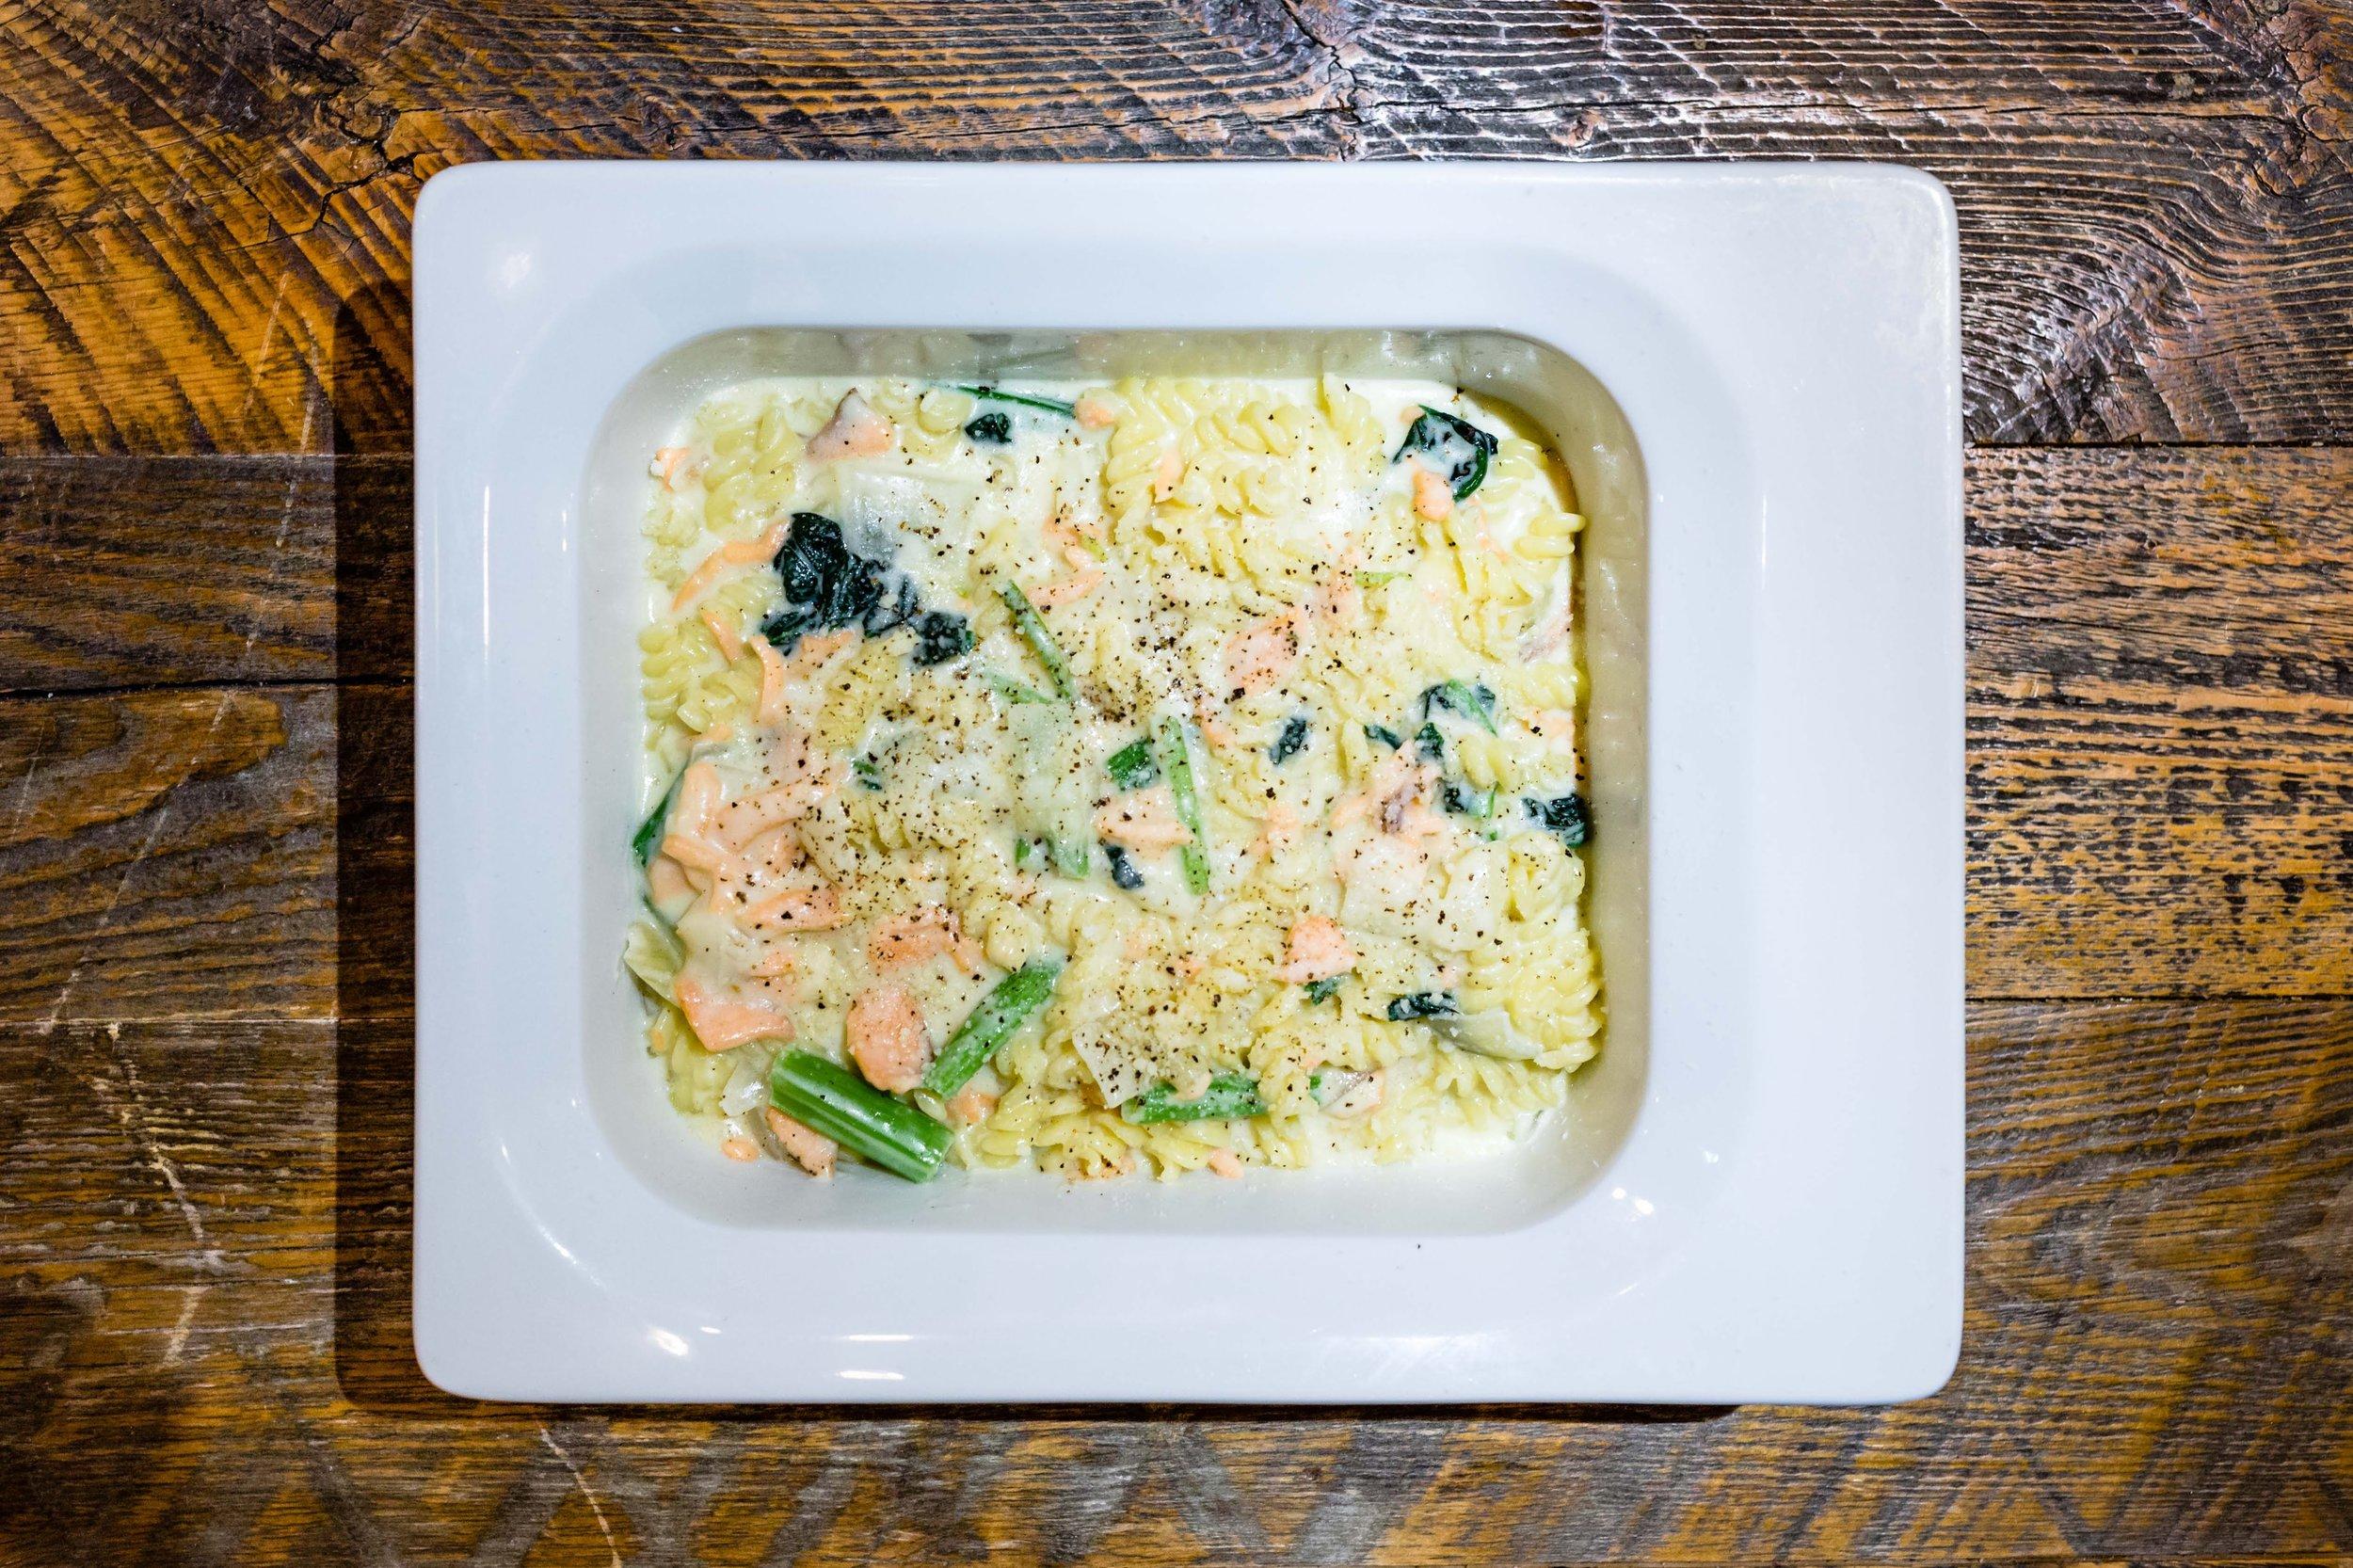 Pasta & Rice Platters - 麺の種類やソースは他のプランとの組み合わせで変えることができます。ベジタリアン、ビーガン、グルテンフリー対応可能です。シェフズパスタ 5名様分 ¥2,500円〜トマトソース5名様分 ¥2,500円〜クリームソース5名様分 ¥2,500円〜アーリオオーリオ 5名様分 ¥2,500円〜ラザニア5名様分 ¥4,000〜